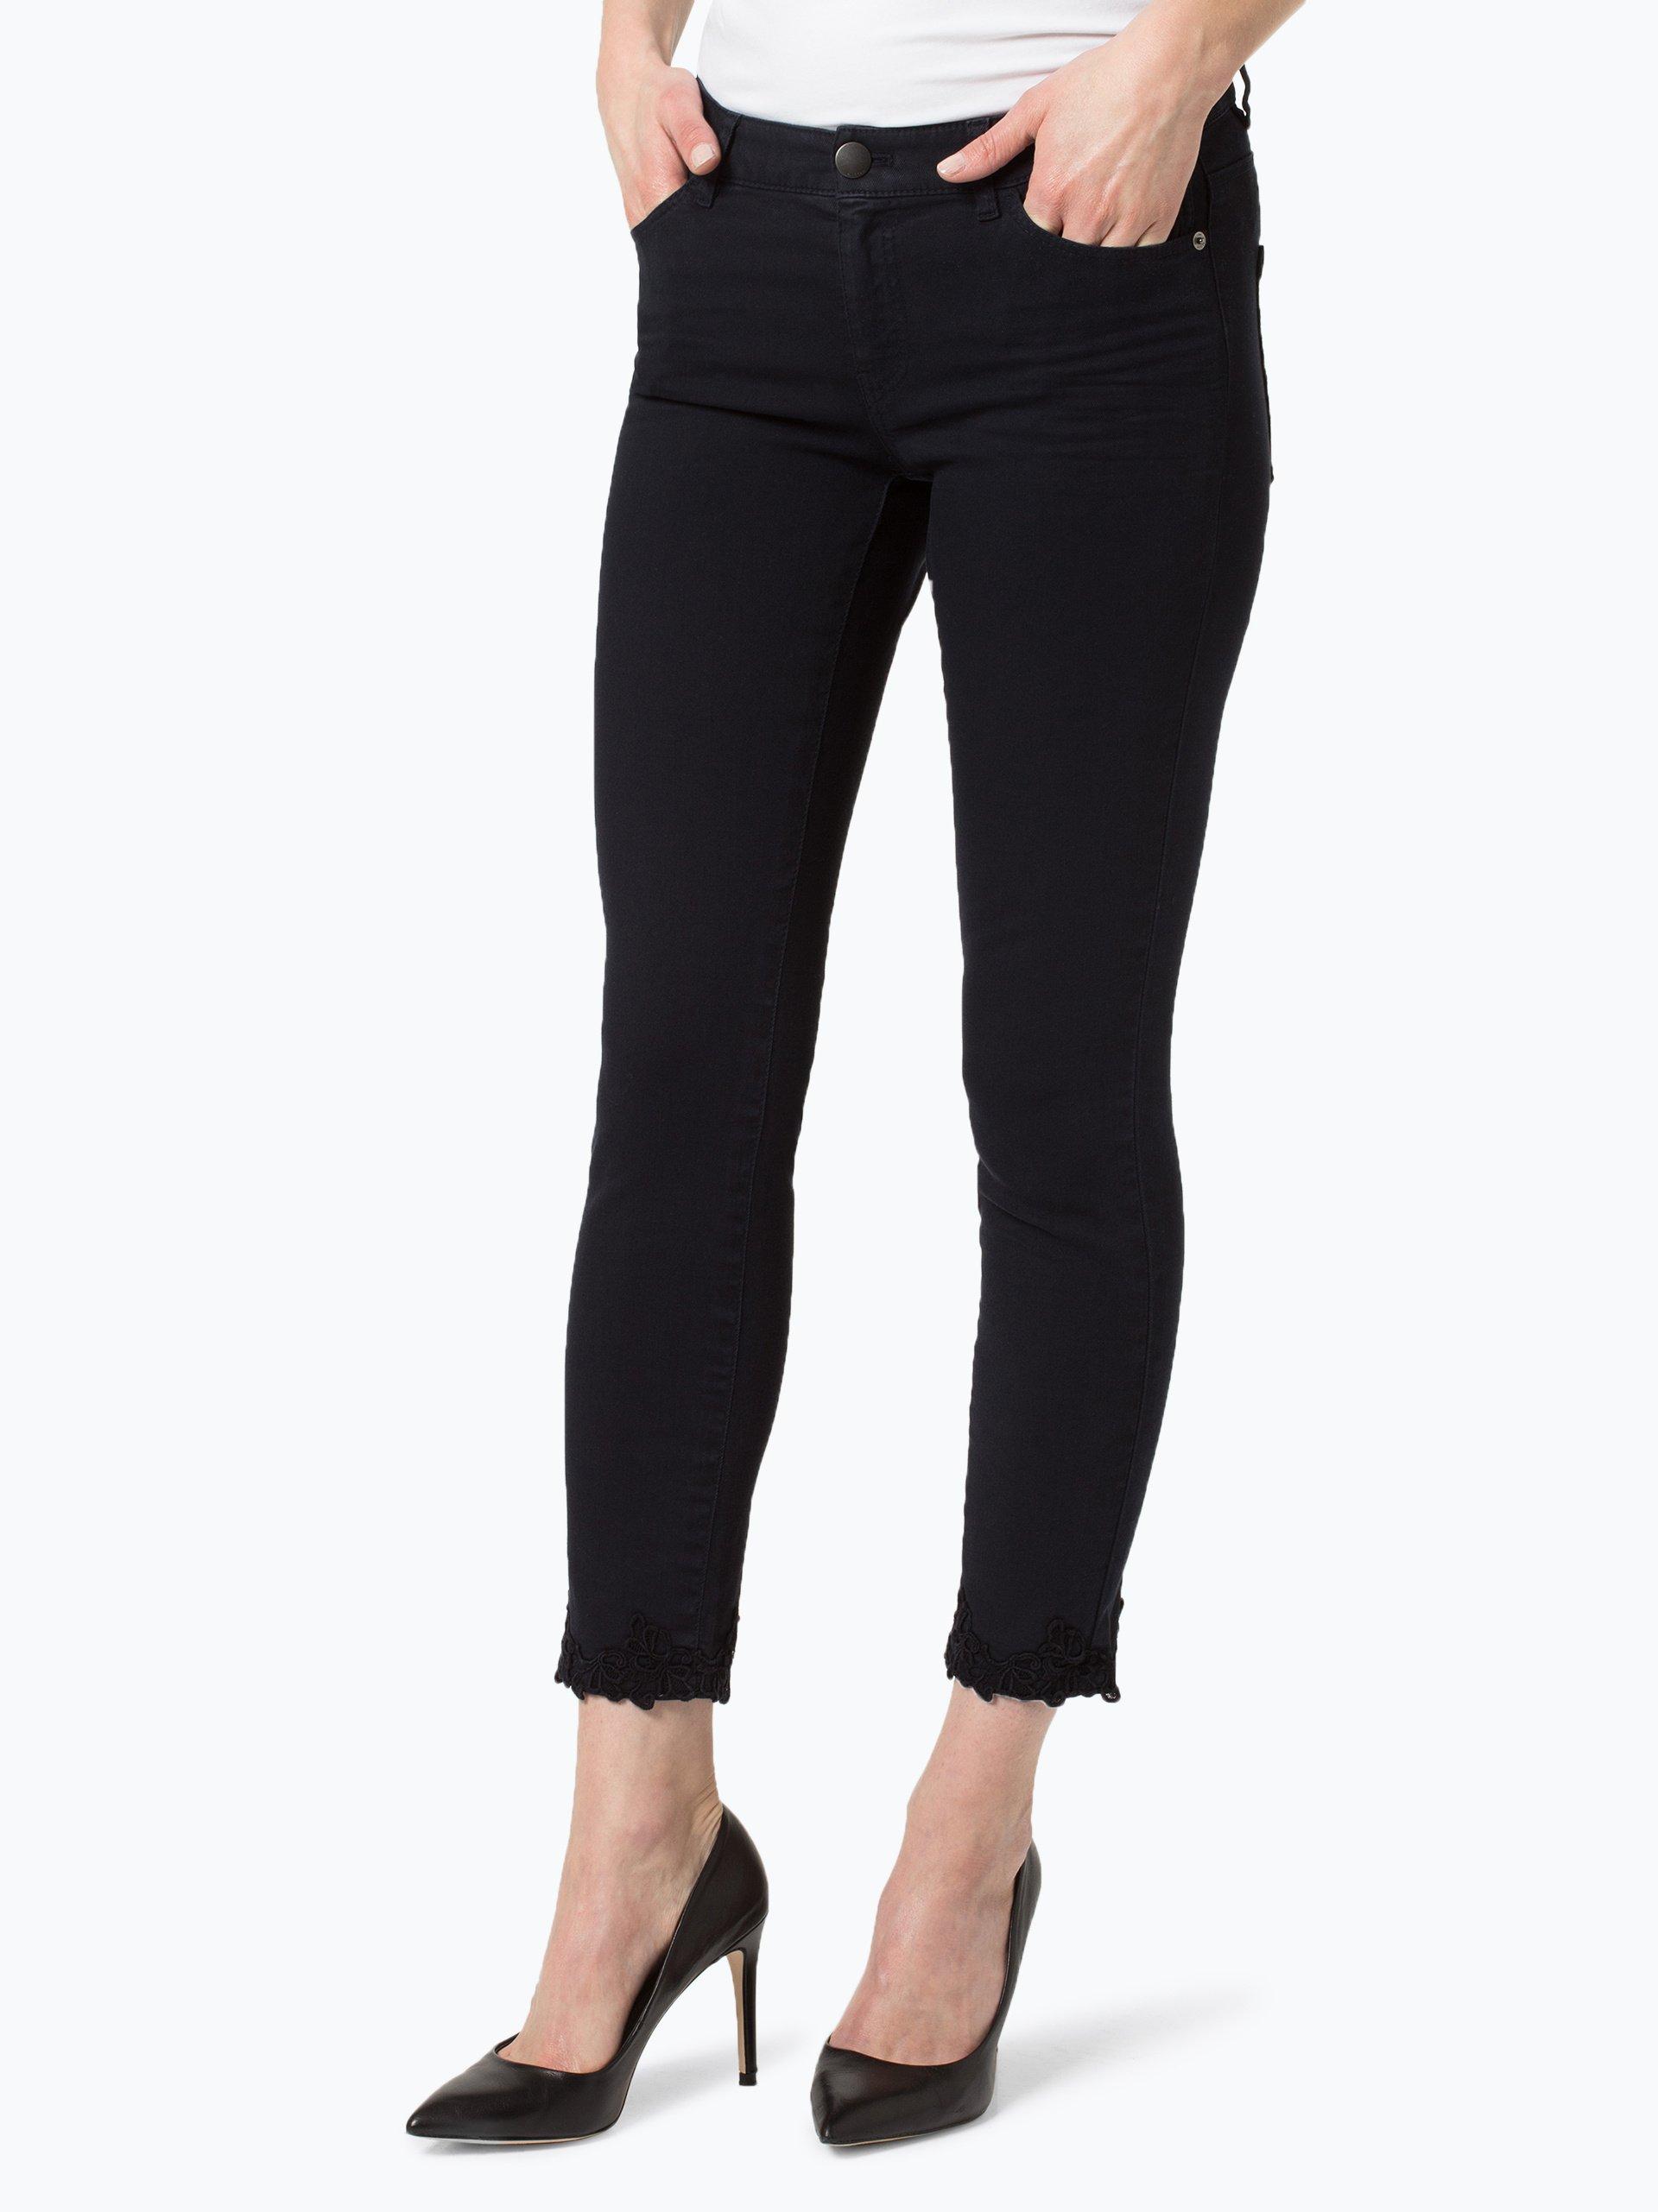 marc cain collections damen jeans marine uni online kaufen. Black Bedroom Furniture Sets. Home Design Ideas